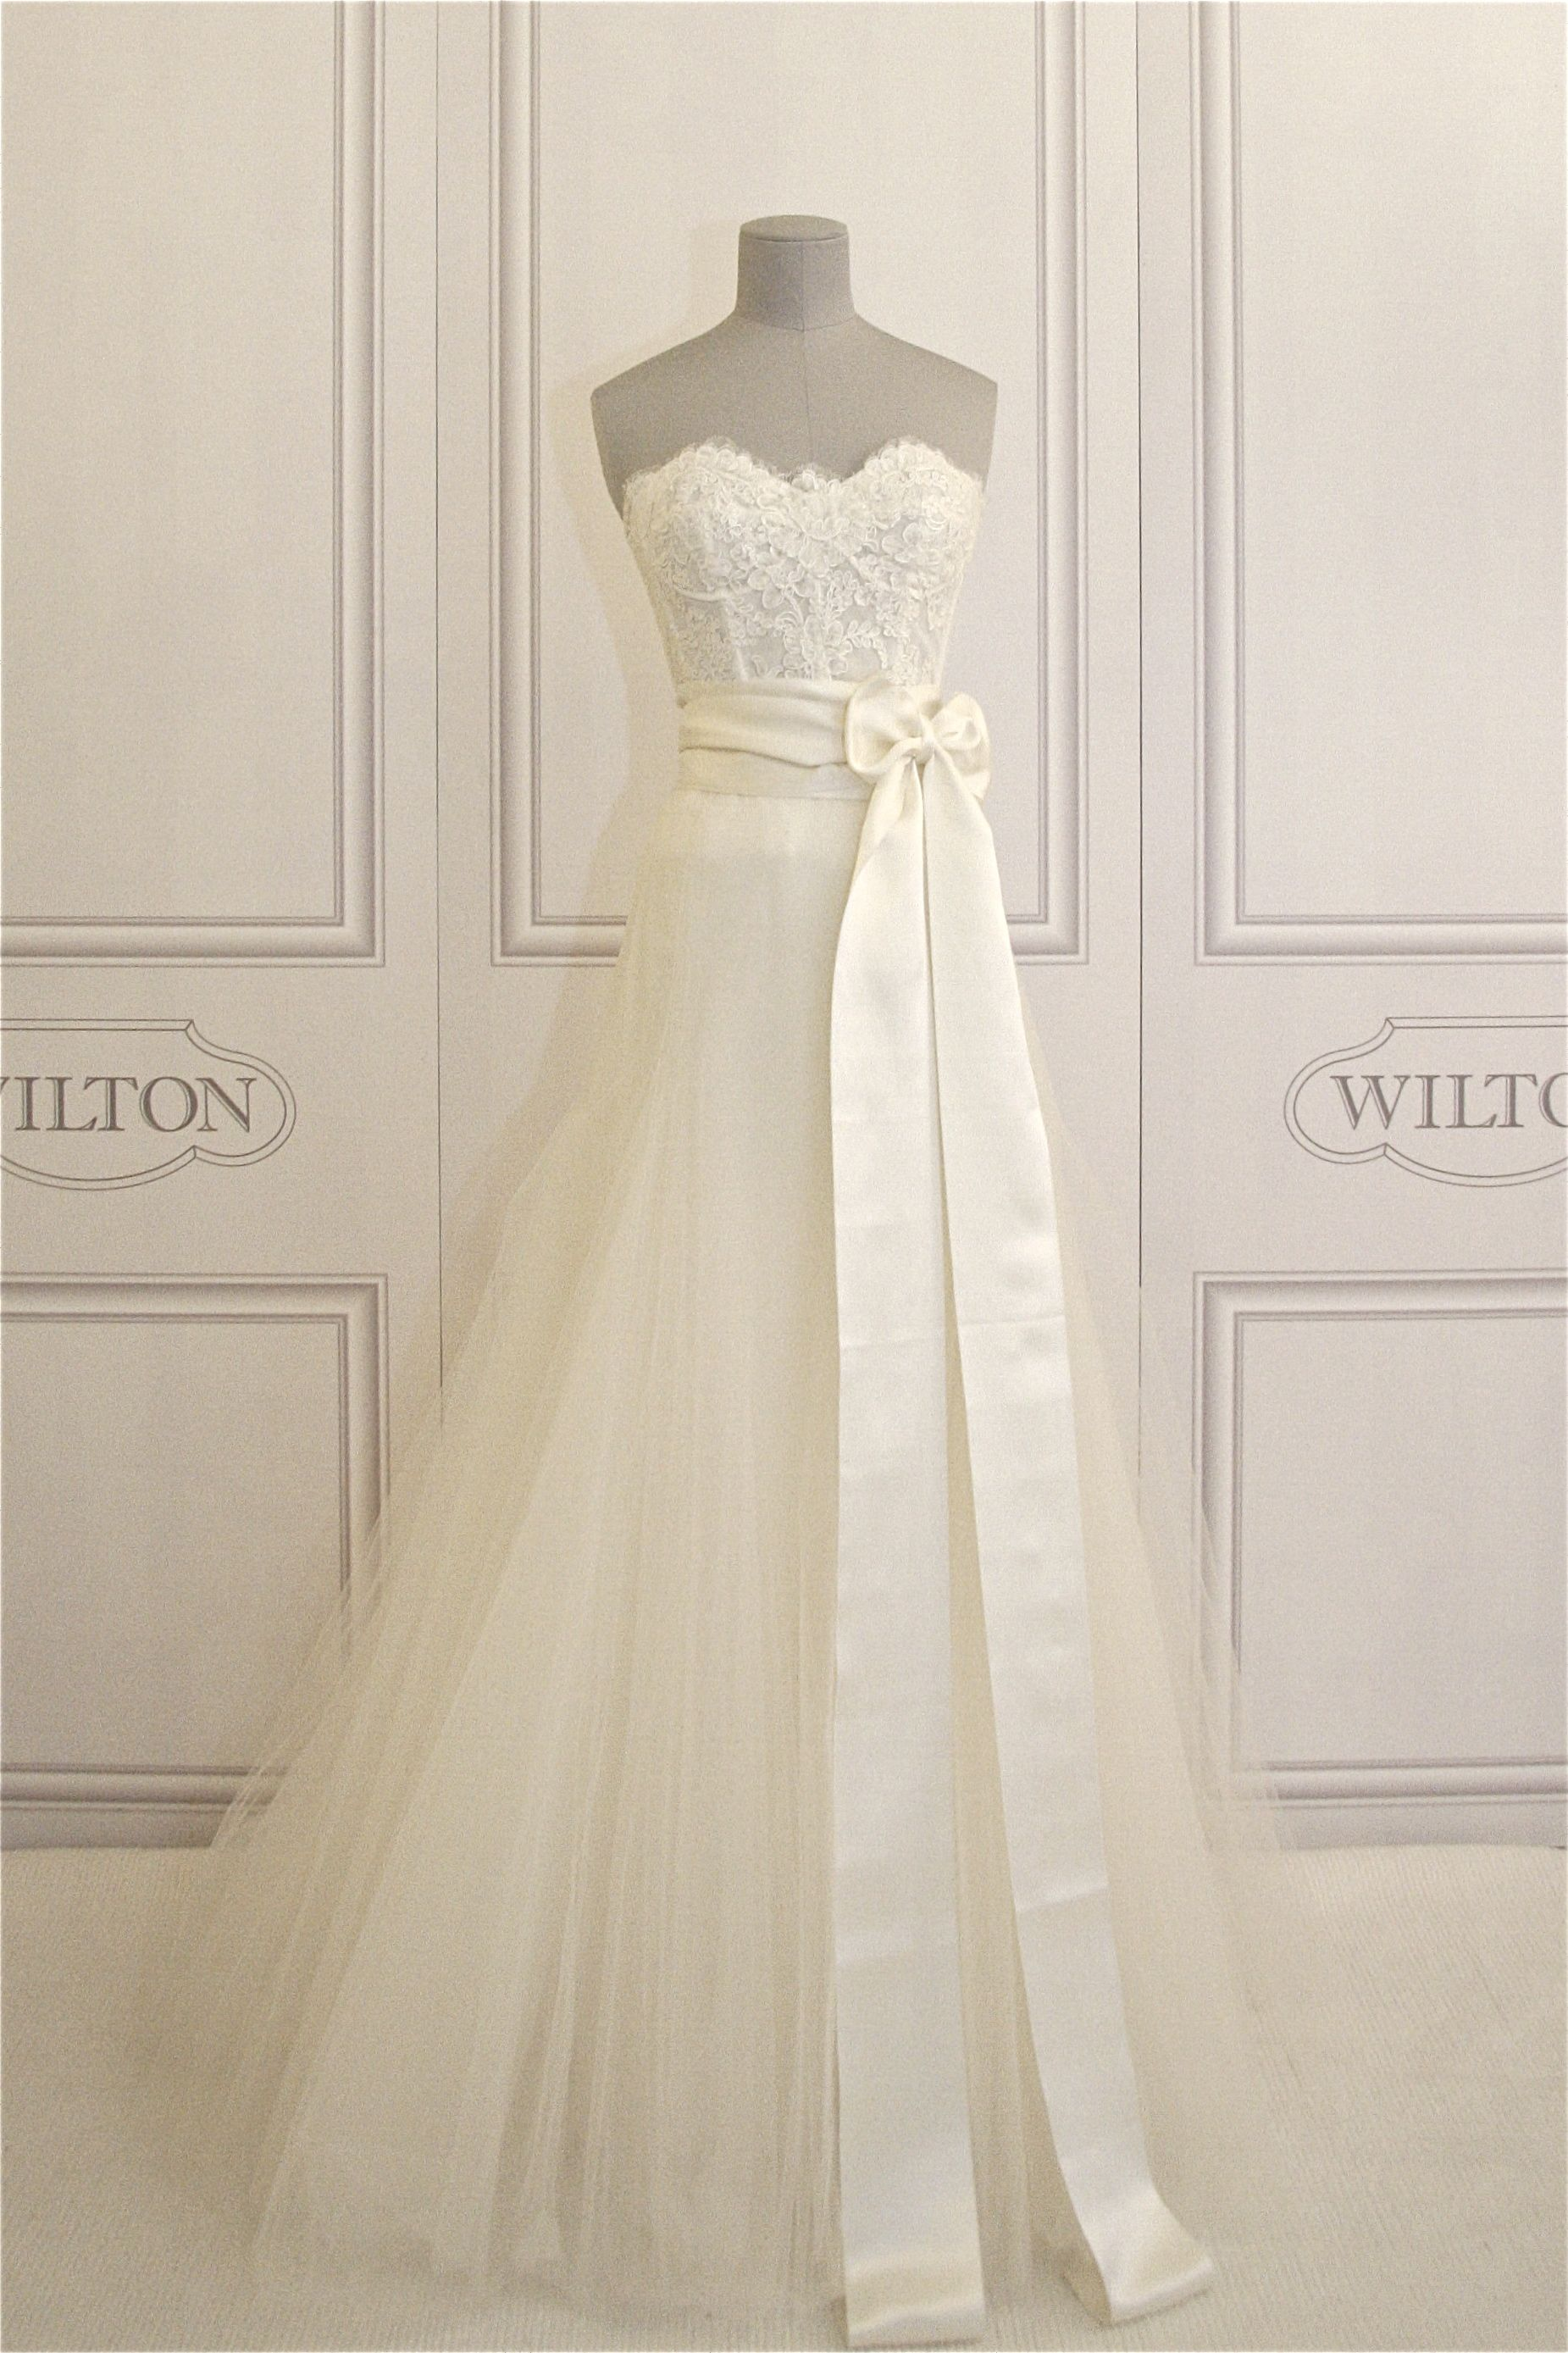 Robe de Mariee Geneve / Wedding dress Geneva, Lausanne, Lyon ...